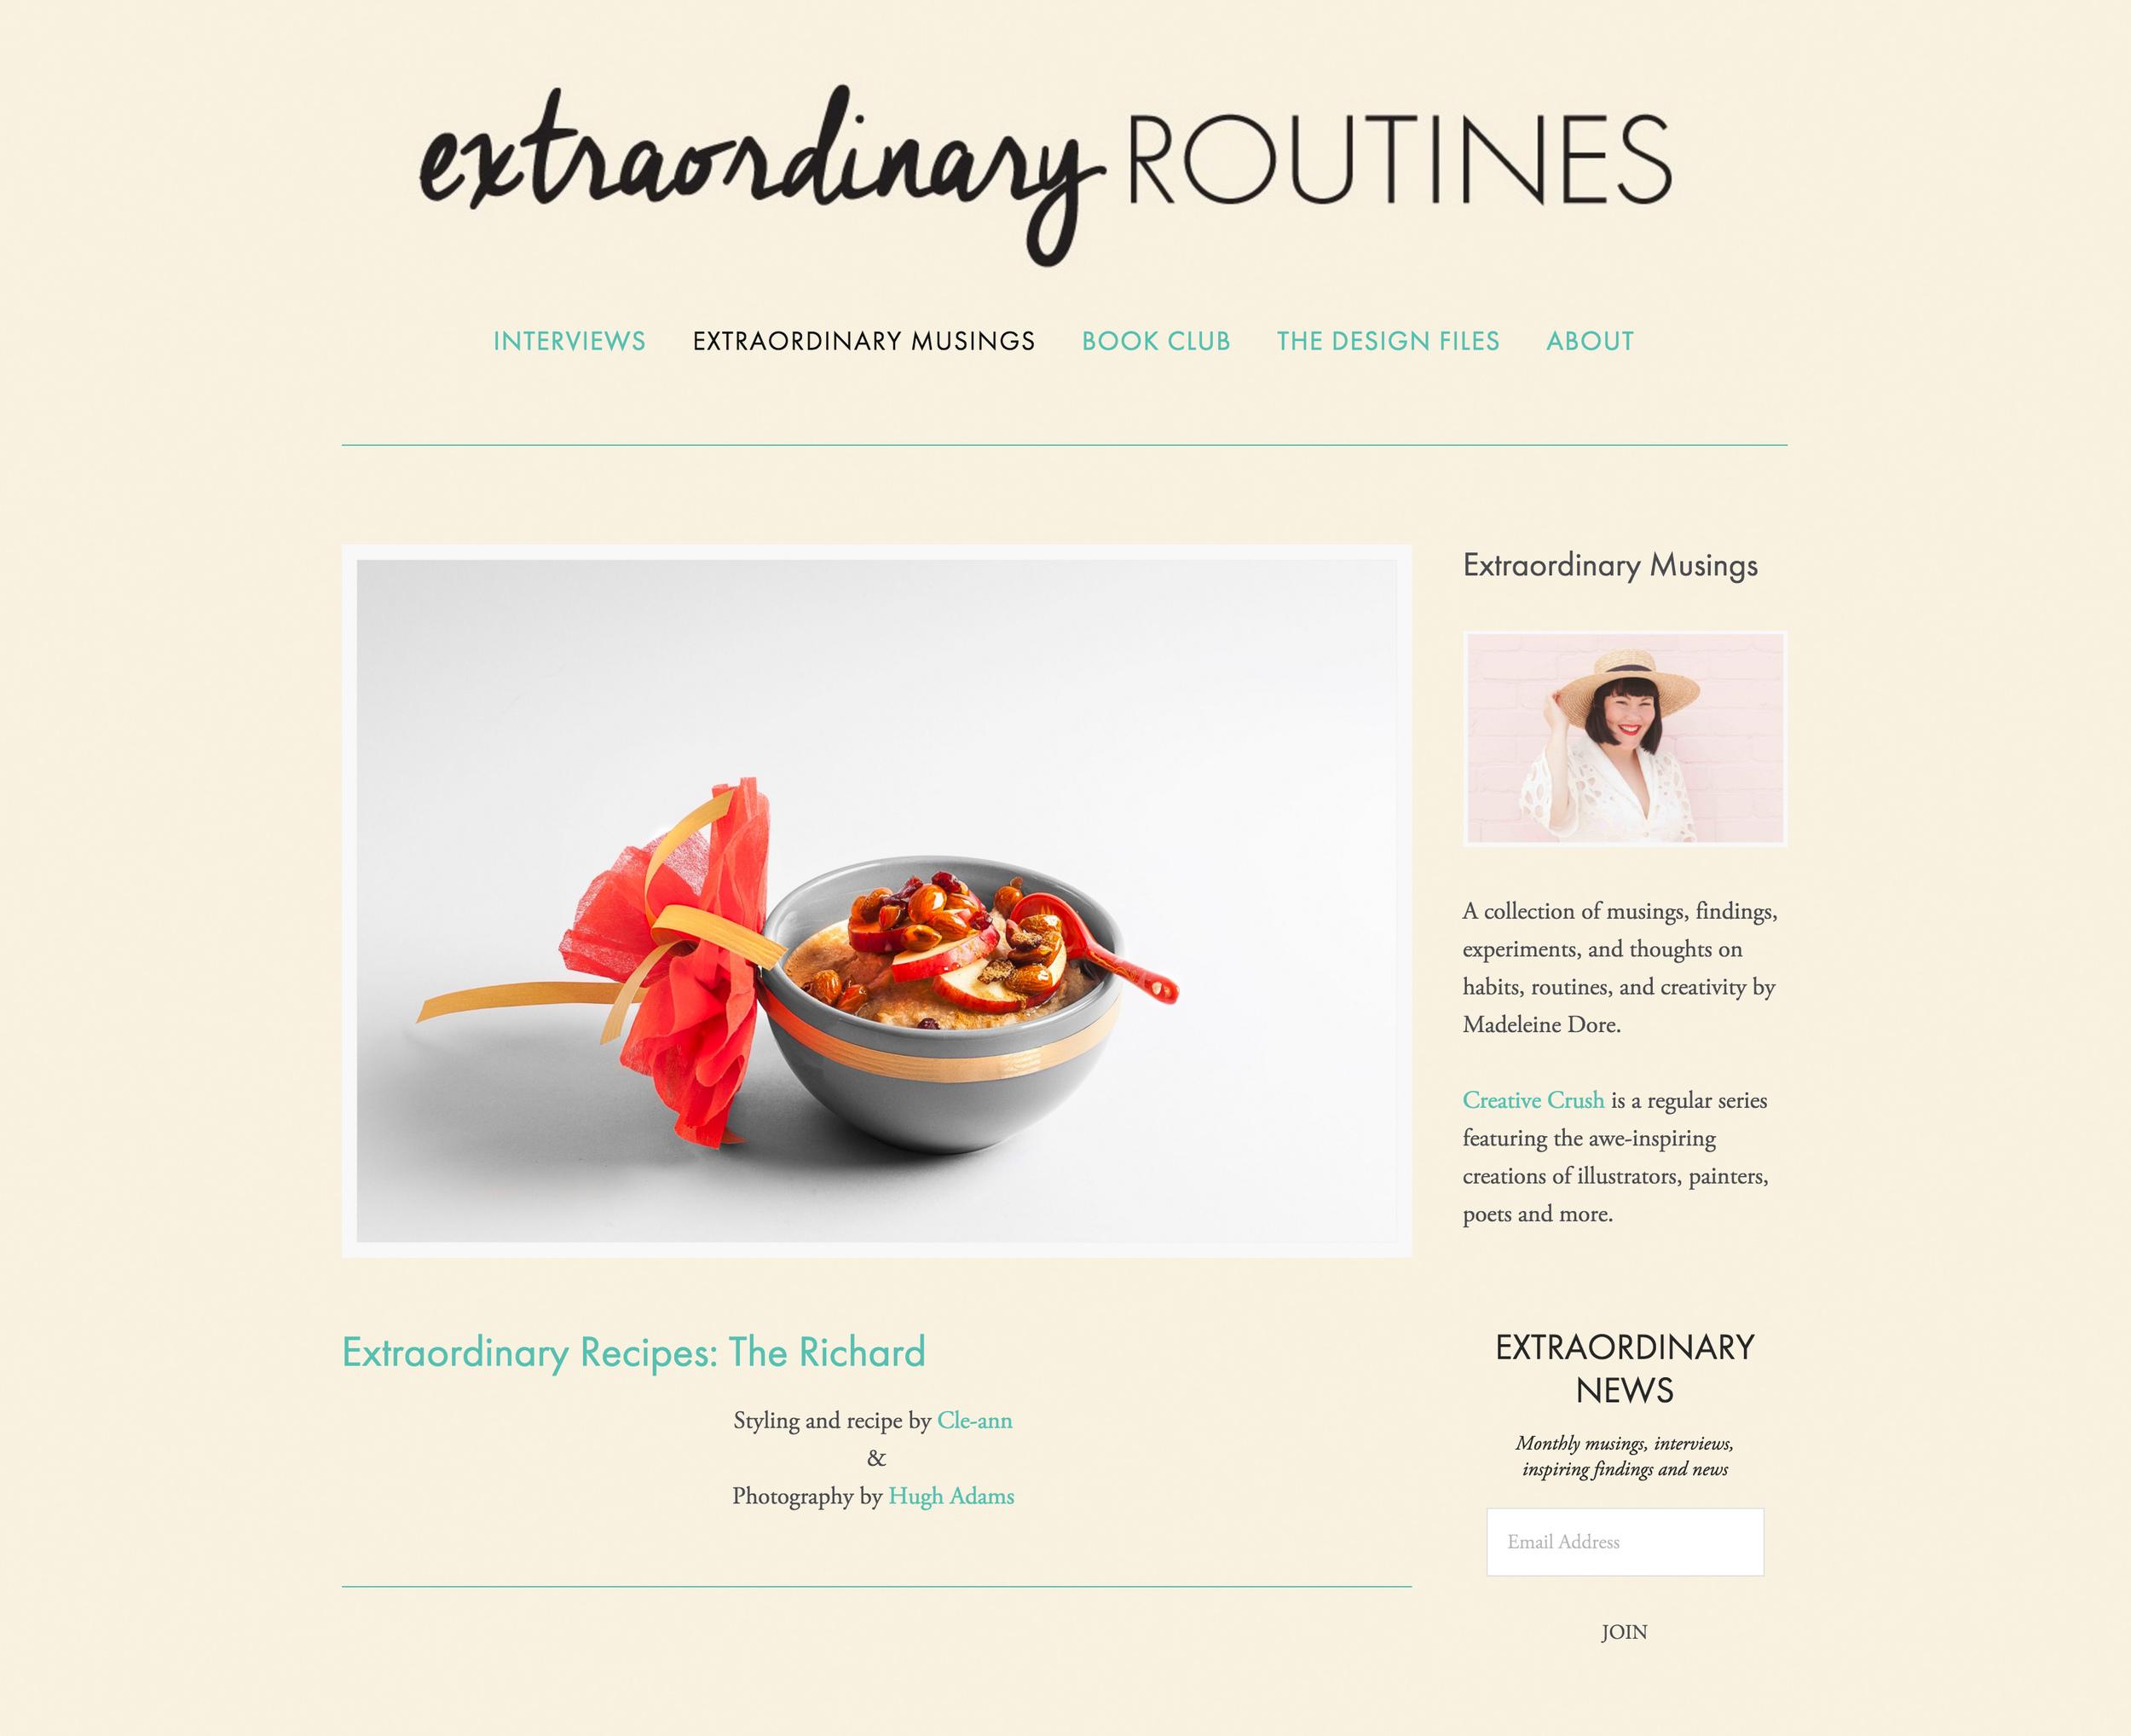 Extorinary Routines_The_Richard.jpg